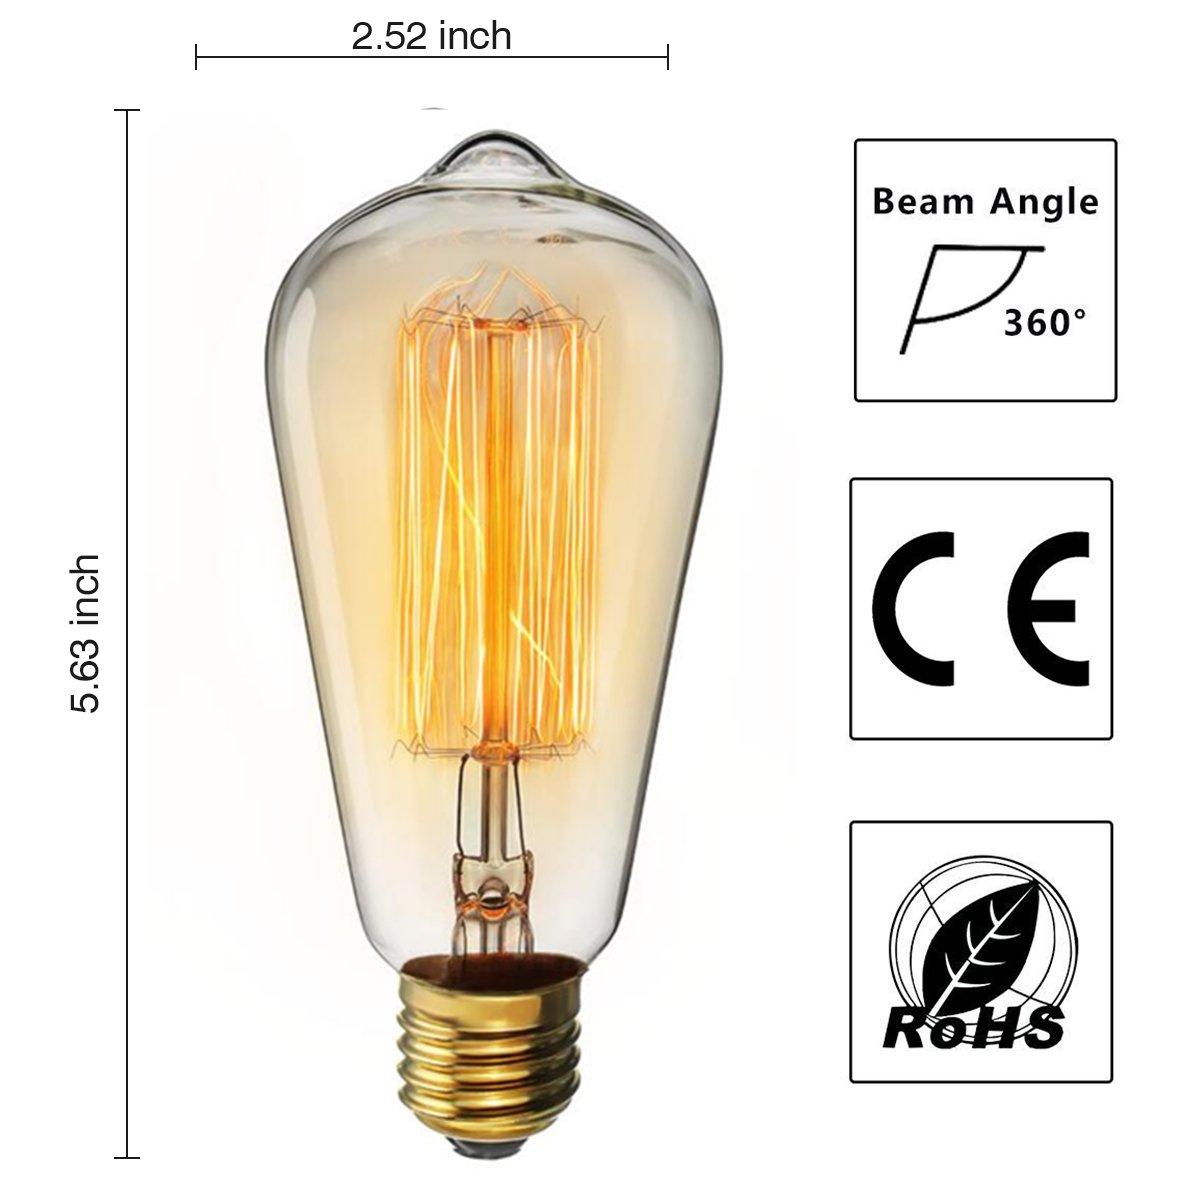 KINGSO Vintage Edison Bulbs 40W Squirrel Cage Filament Incandescent Antique Light Bulb for Home Light Fixtures E27 Base ST64 110V - 12 Pack